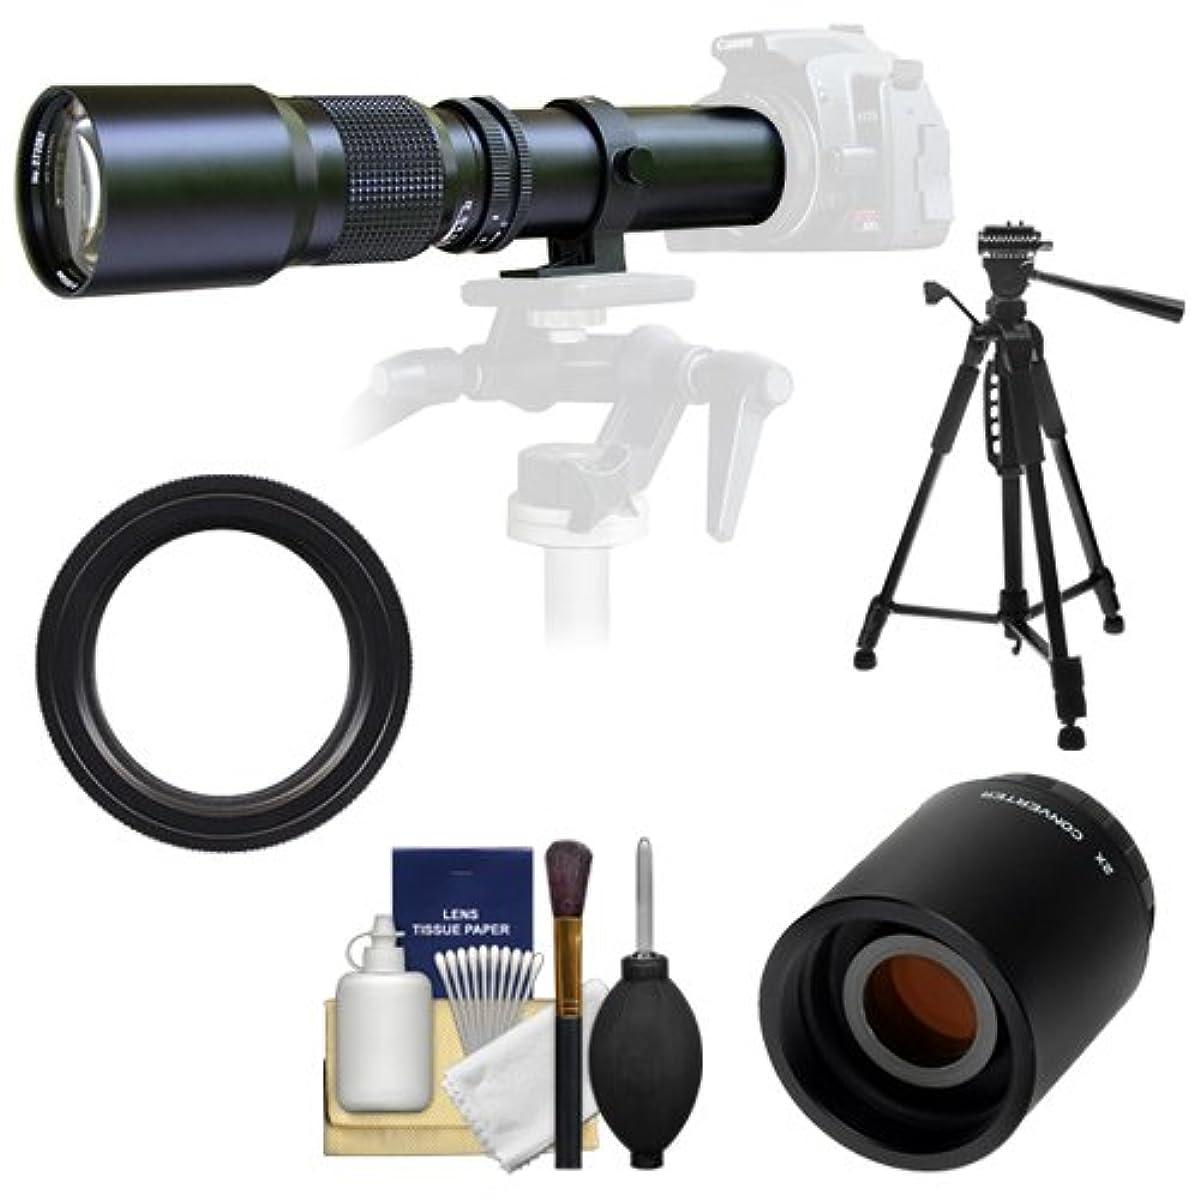 Samyang 500mm f/8.0 Telephoto Lens with 2X Teleconverter (=1000mm) + 58